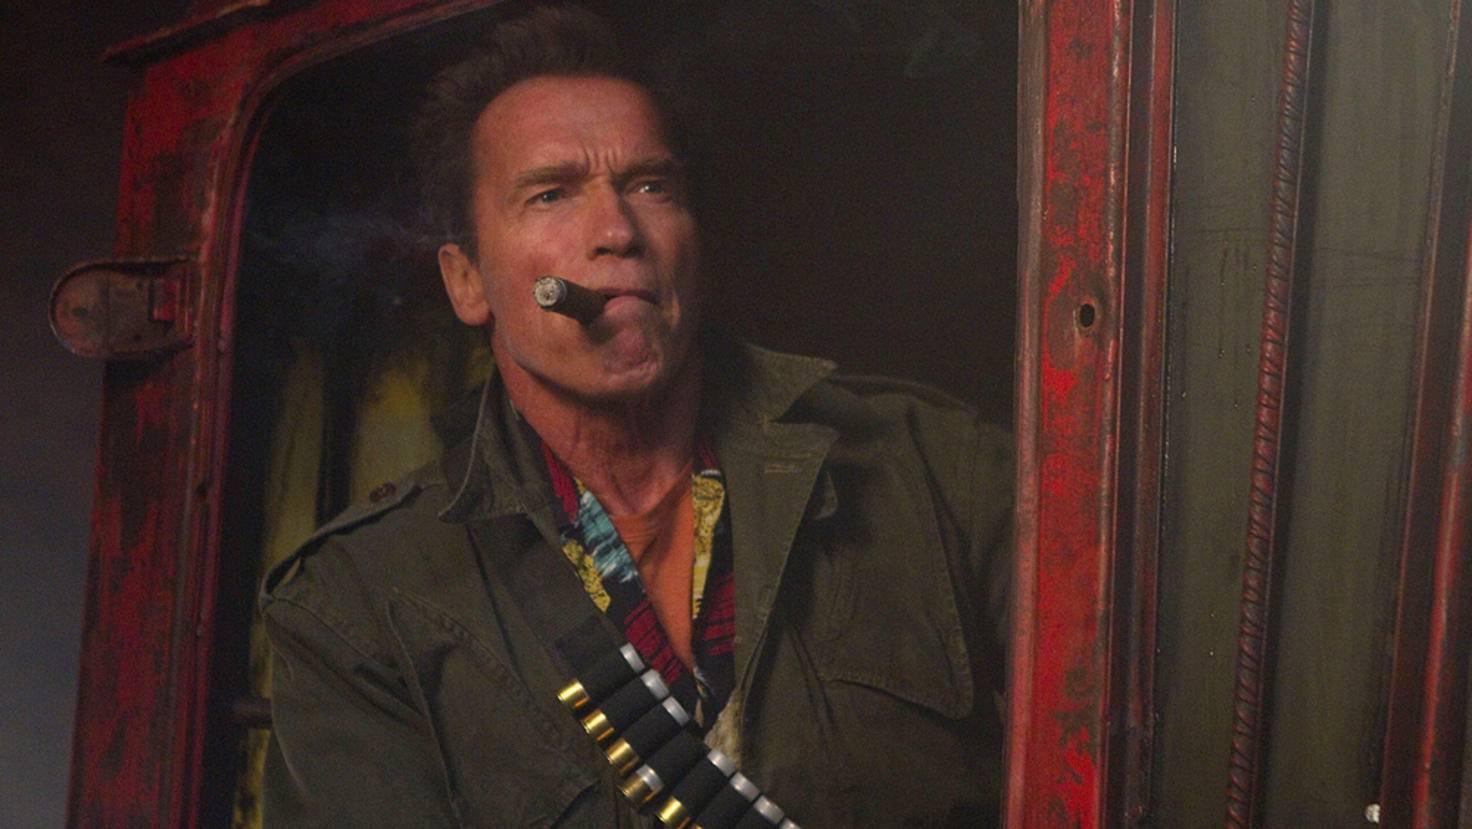 Arnold Schwarzenegger-picture alliance-Everett Collection-92881351